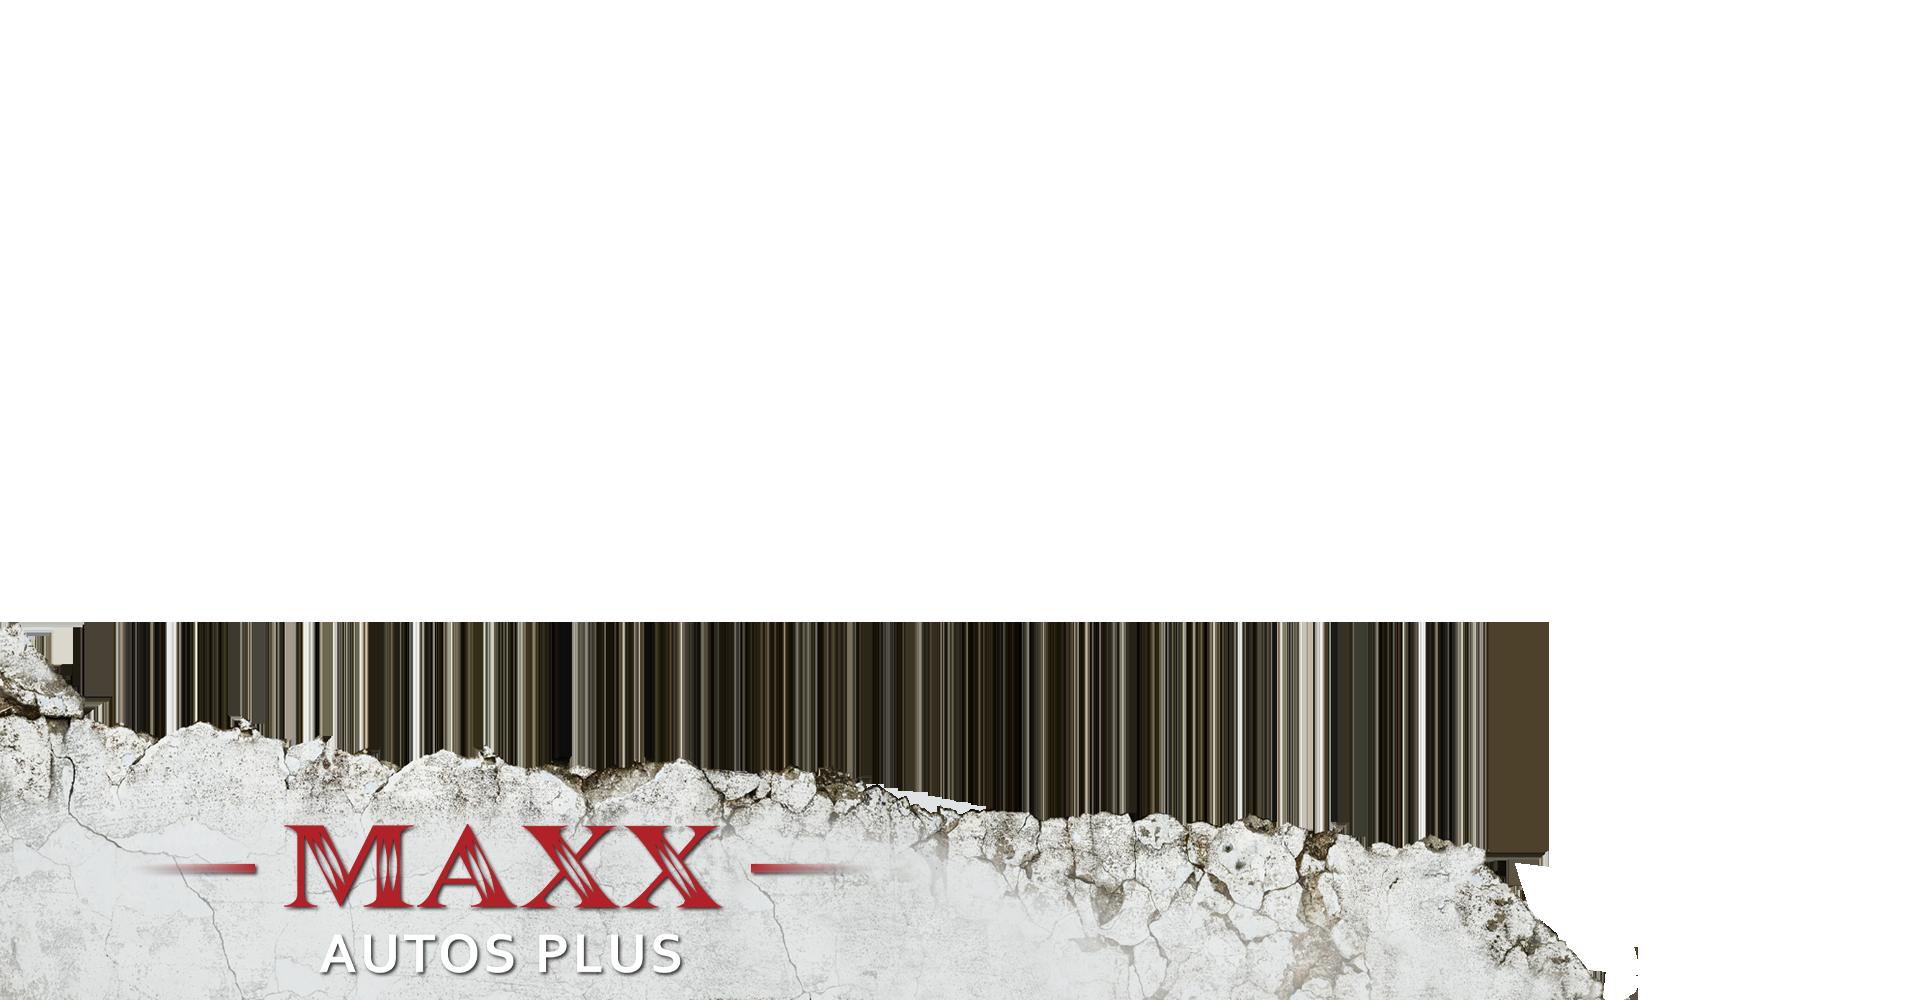 Maxx Autos Plus